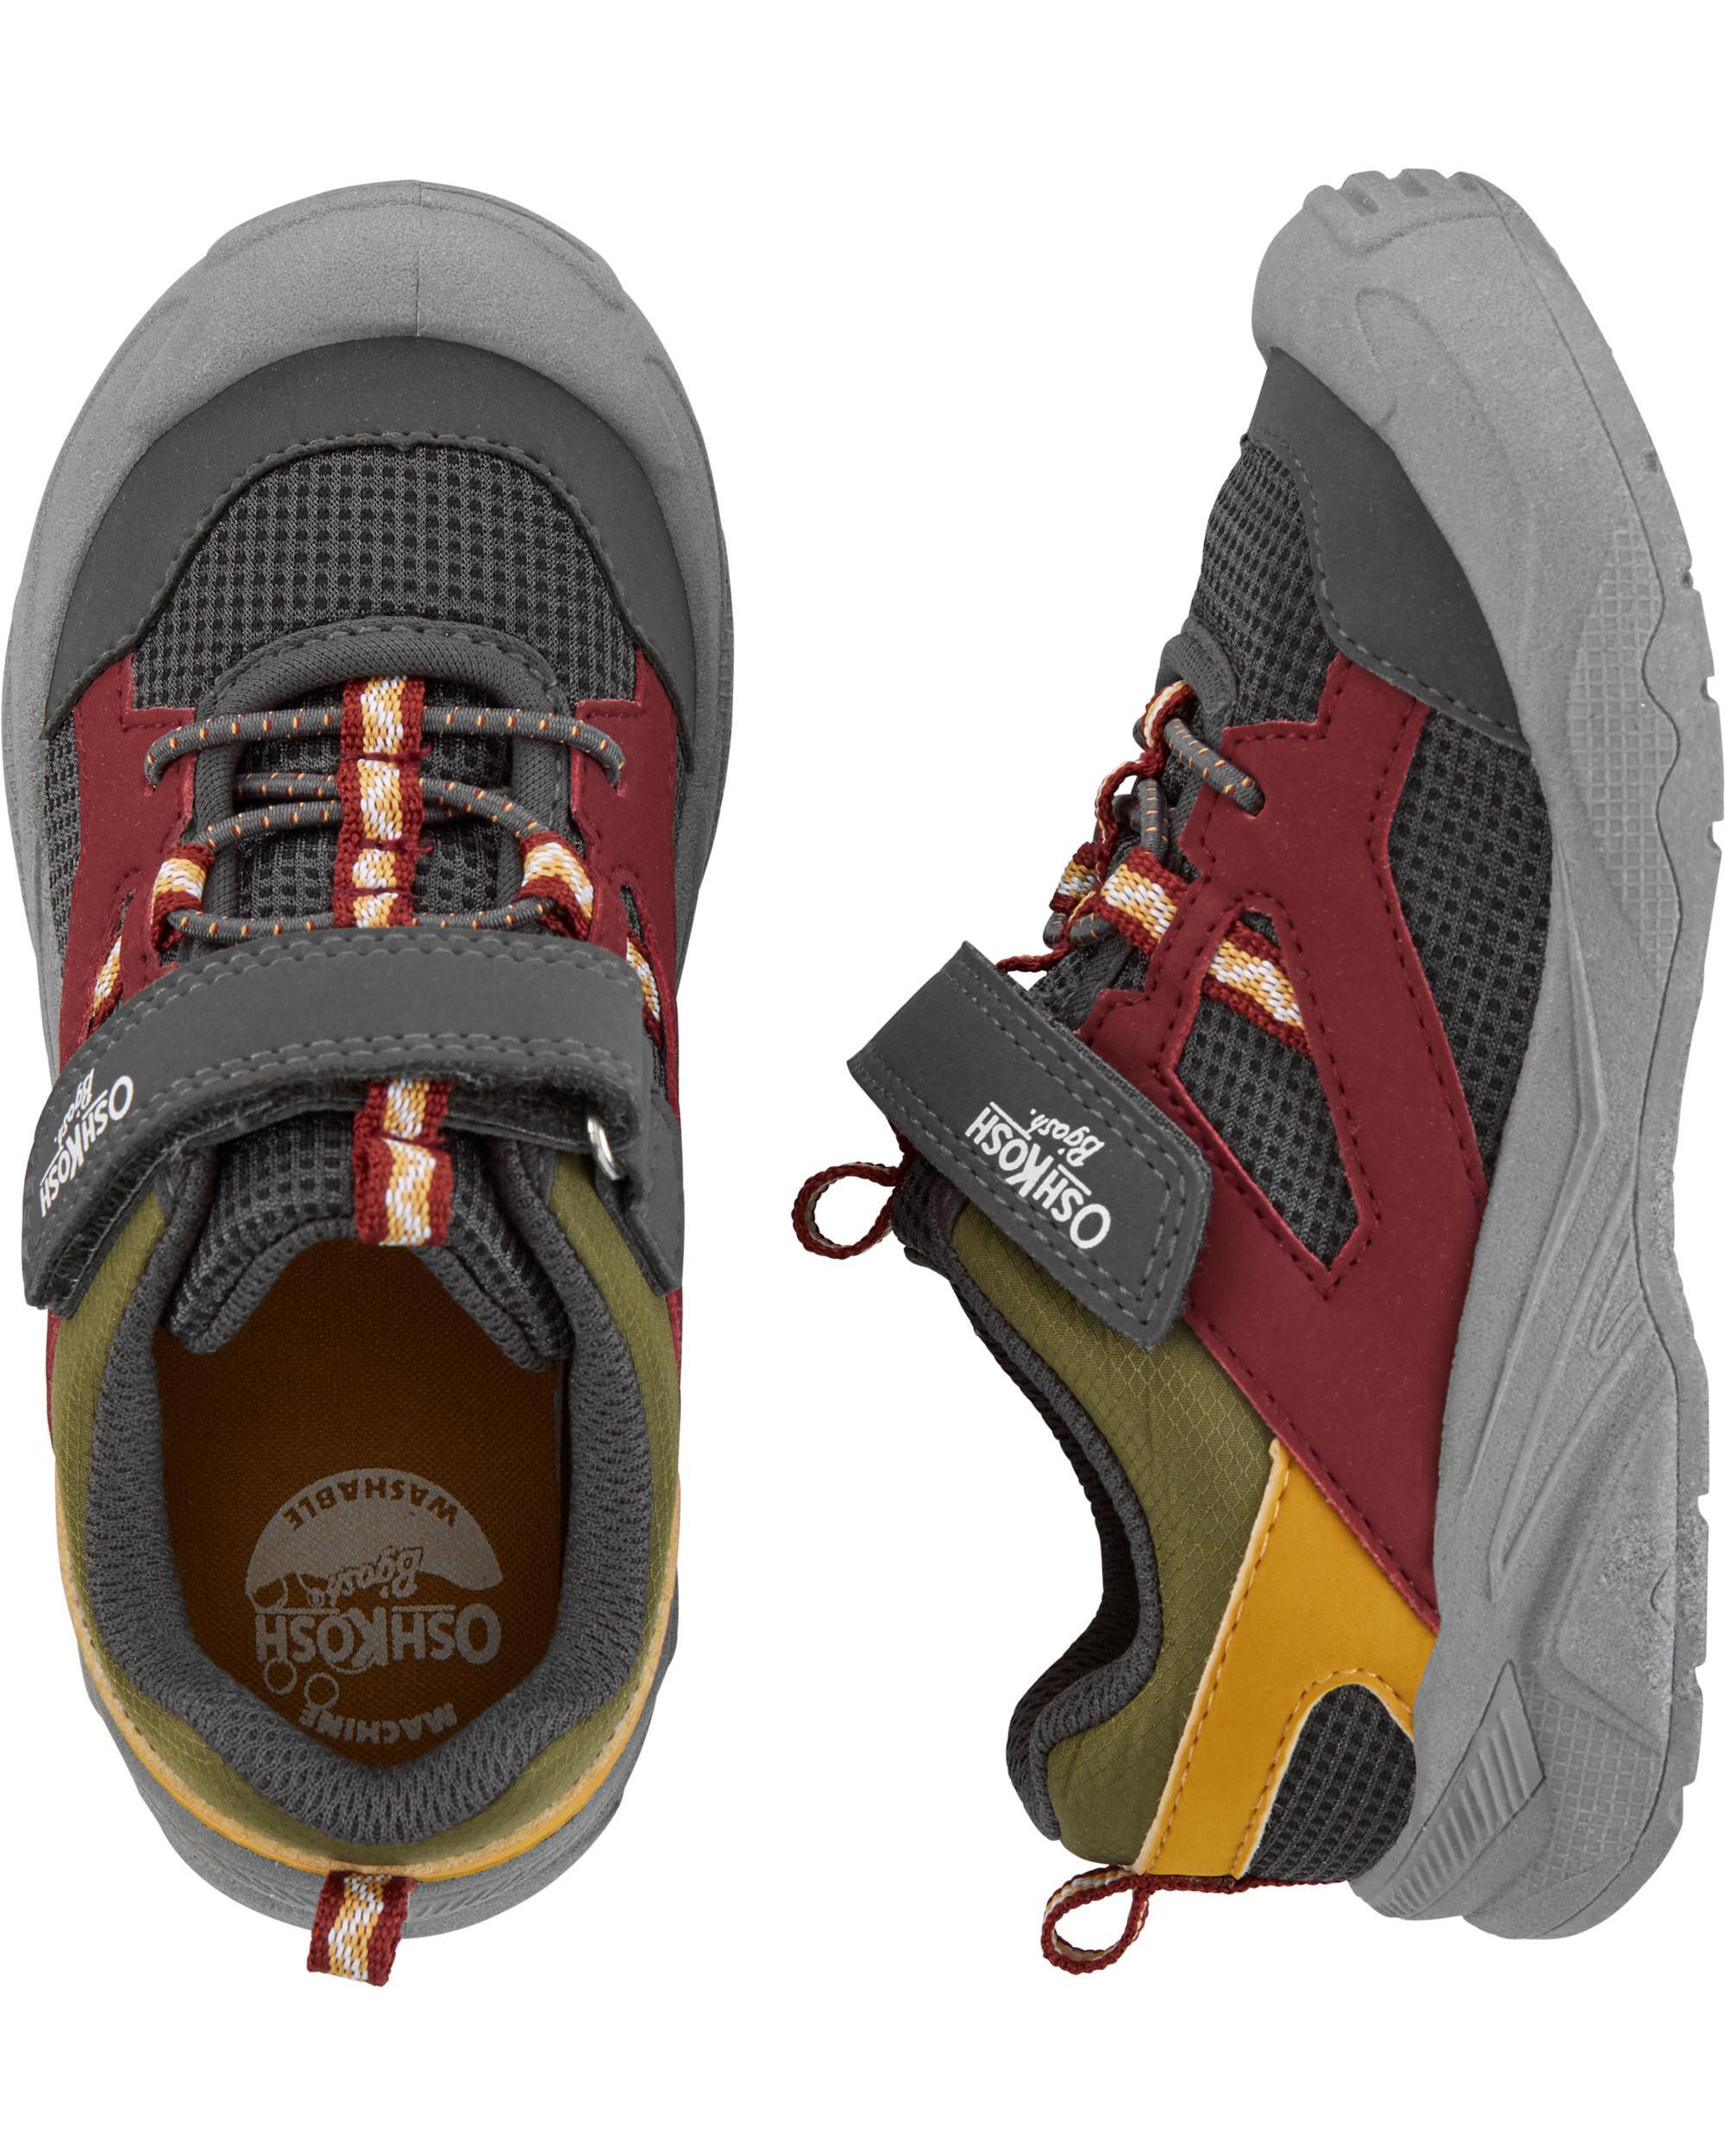 Bump Toe Athletic Sneakers   oshkosh.com